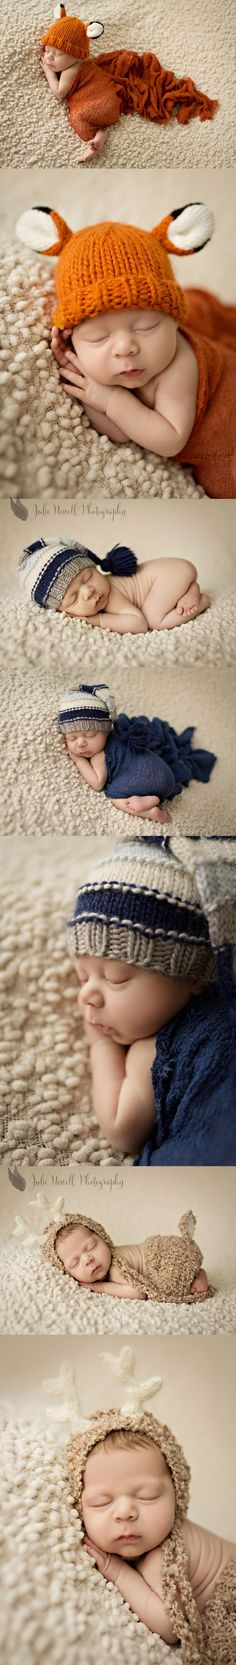 newborn photographer, newborn photography, chicago newborn photographer, chicago newborn photography, newborn boy photographer, newborn boy photography